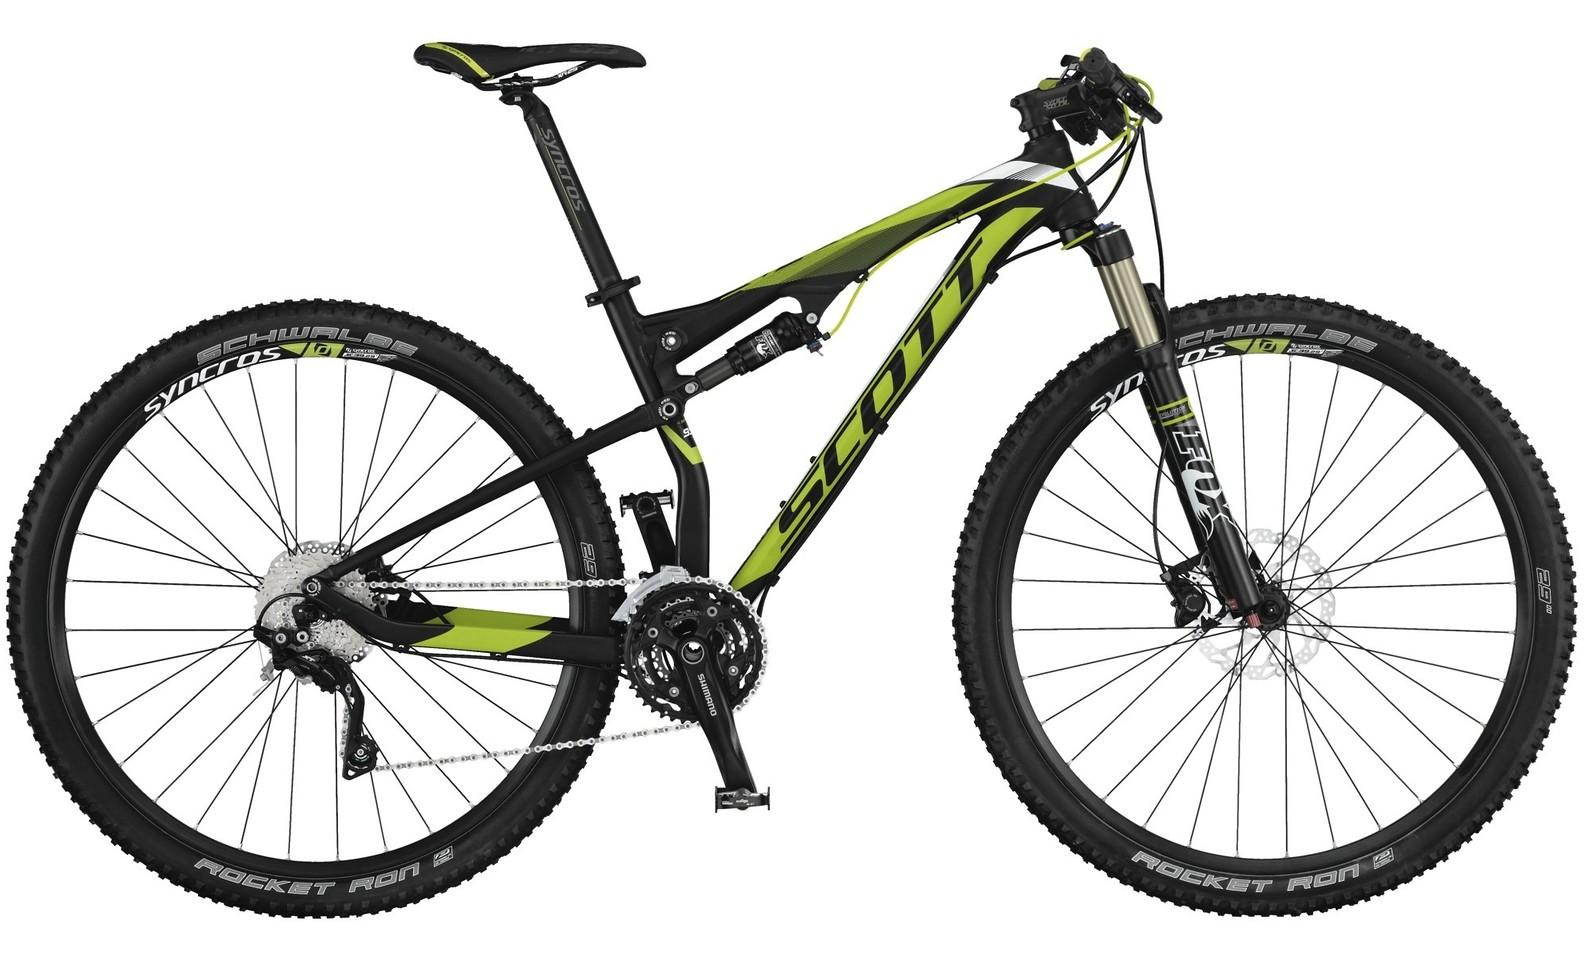 2014 Scott Spark 950 Bike